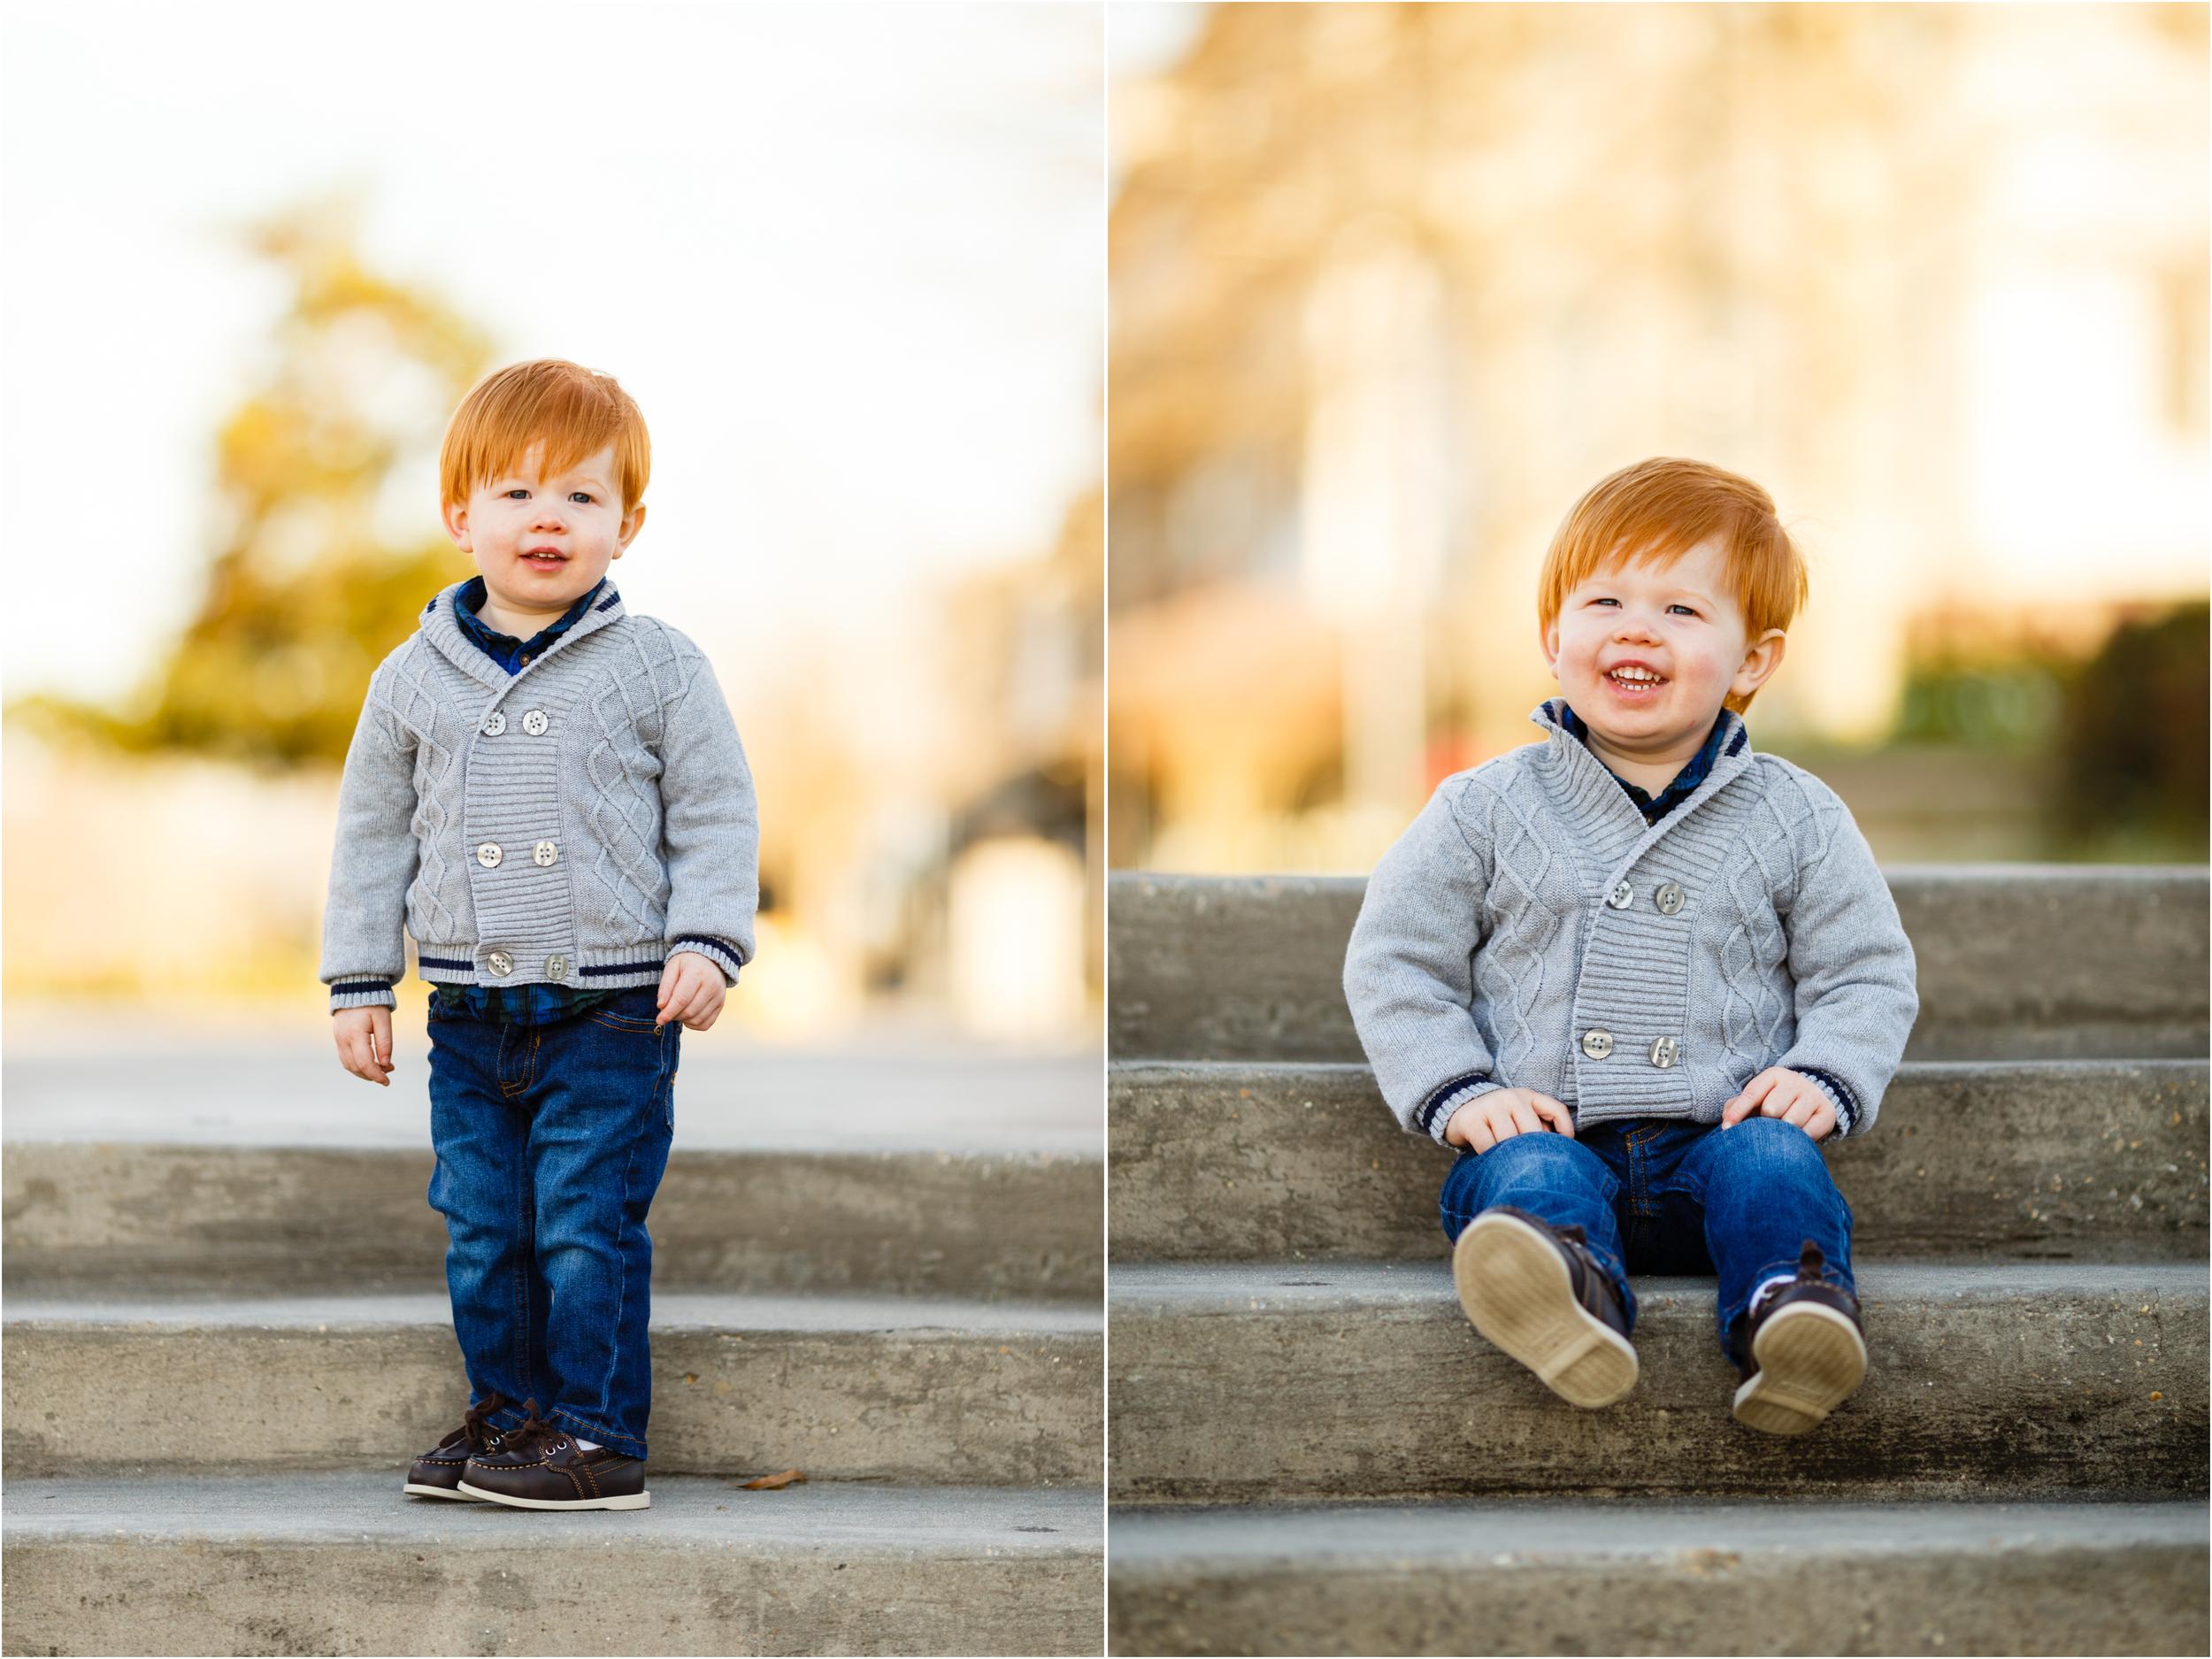 Family-child-portrait-lafayette-broussard-youngsville-photographer (2).jpg